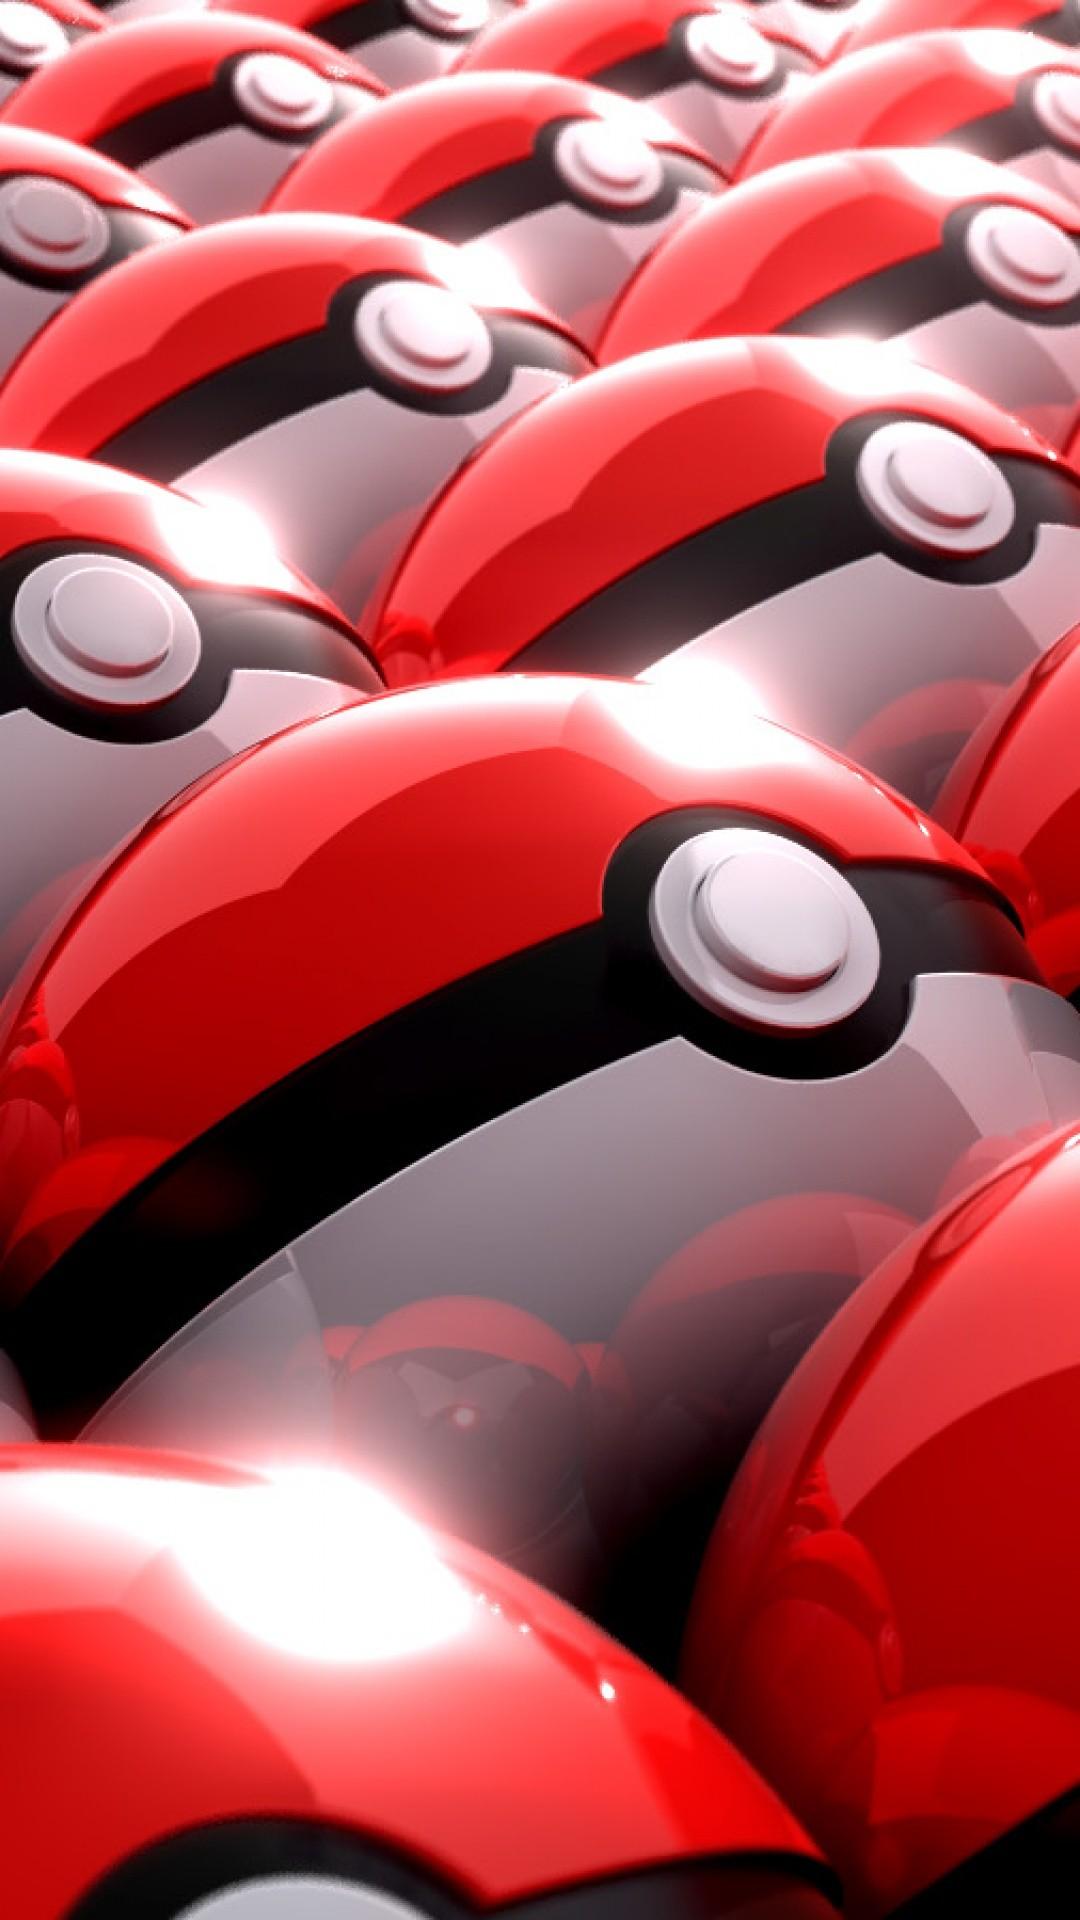 pokemon go mobile wallpapers 1920×1080 hd pokeballs